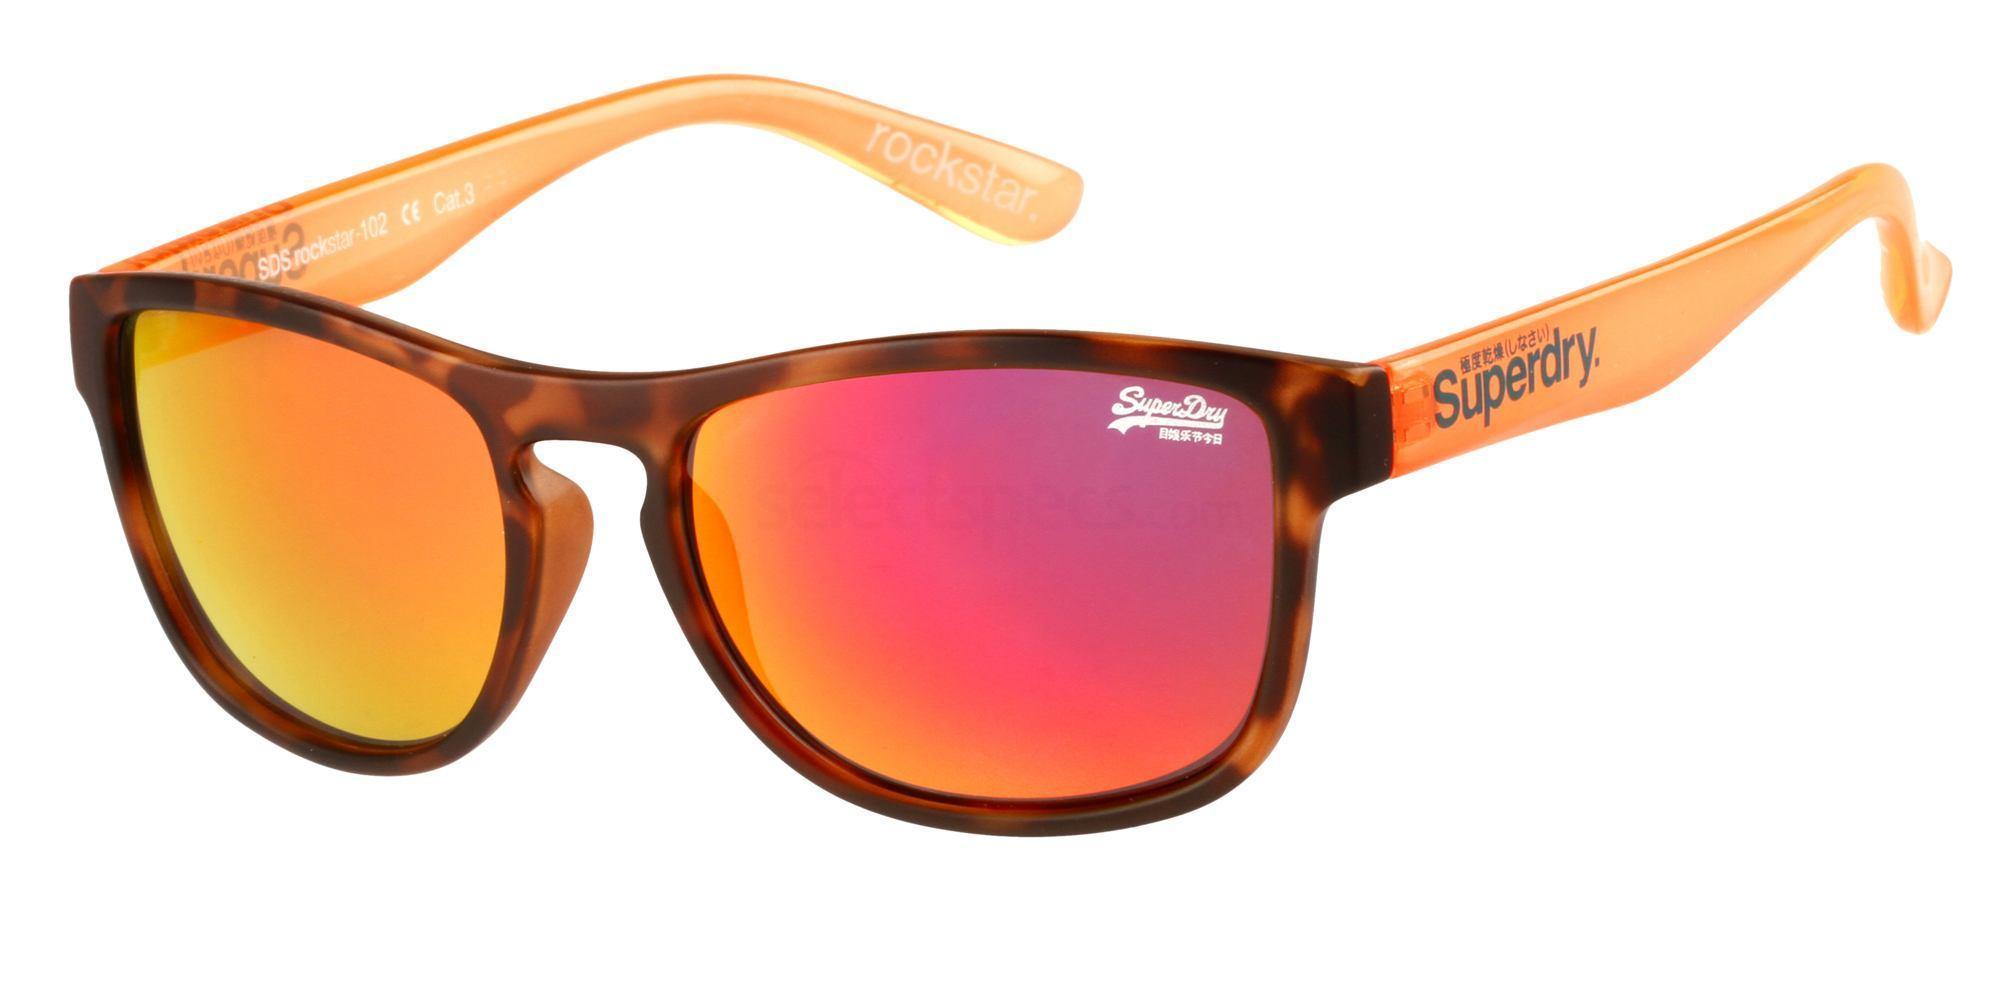 102 SDS-ROCKSTAR ST Sunglasses, Superdry